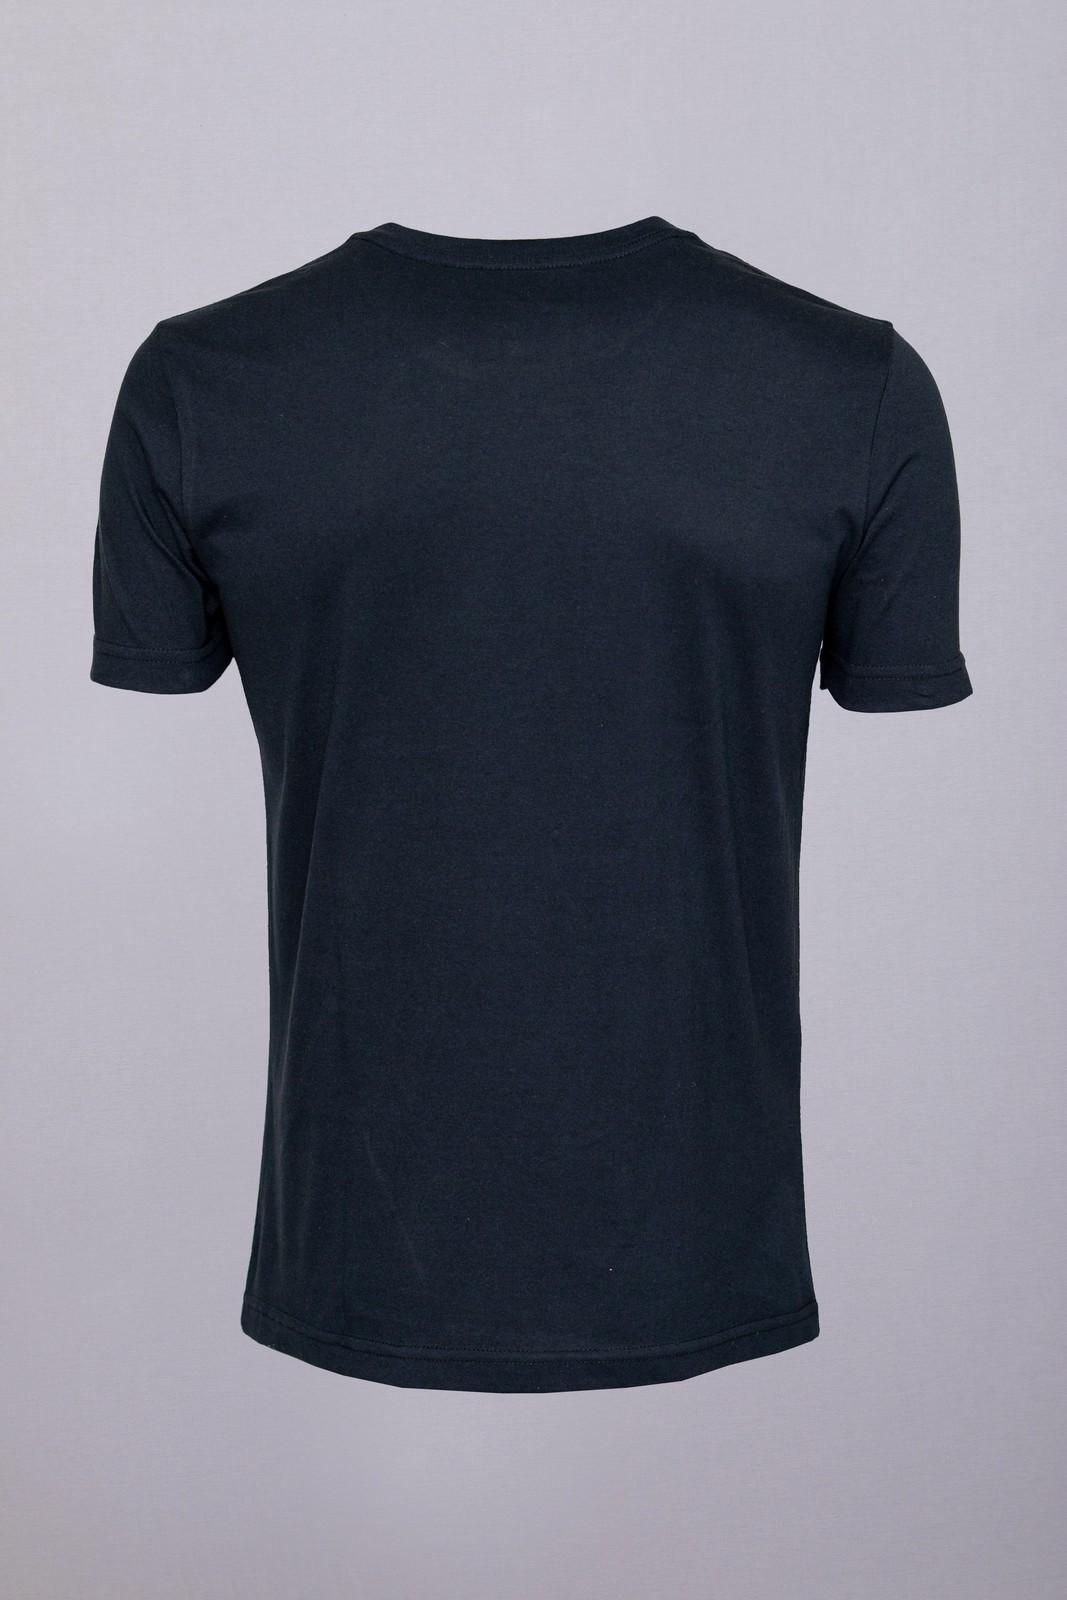 Camiseta CoolWave Western Styles Preta